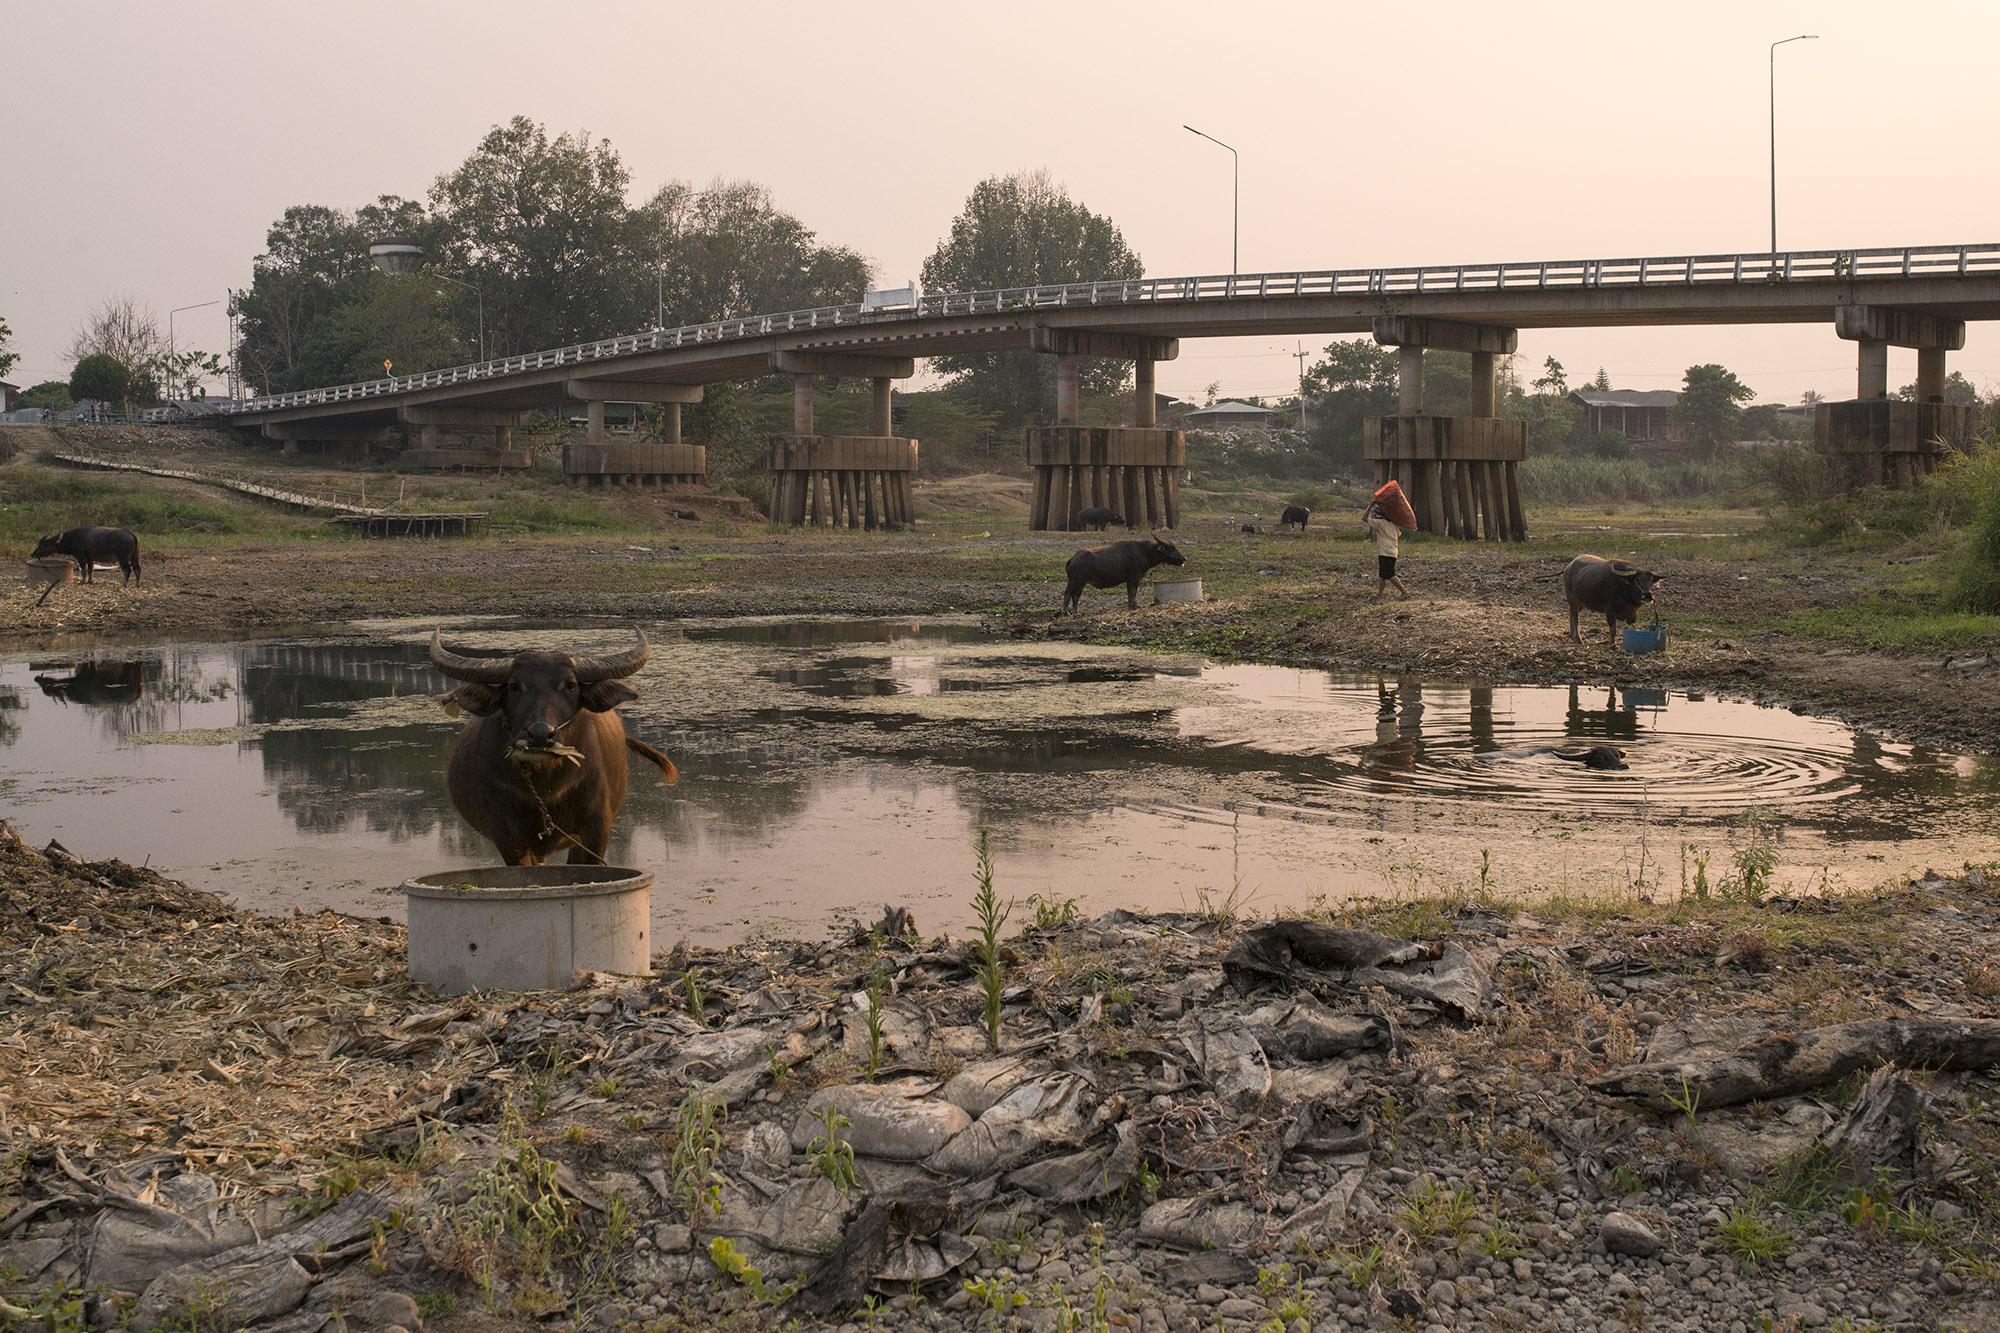 Thailand's Drought Struggle